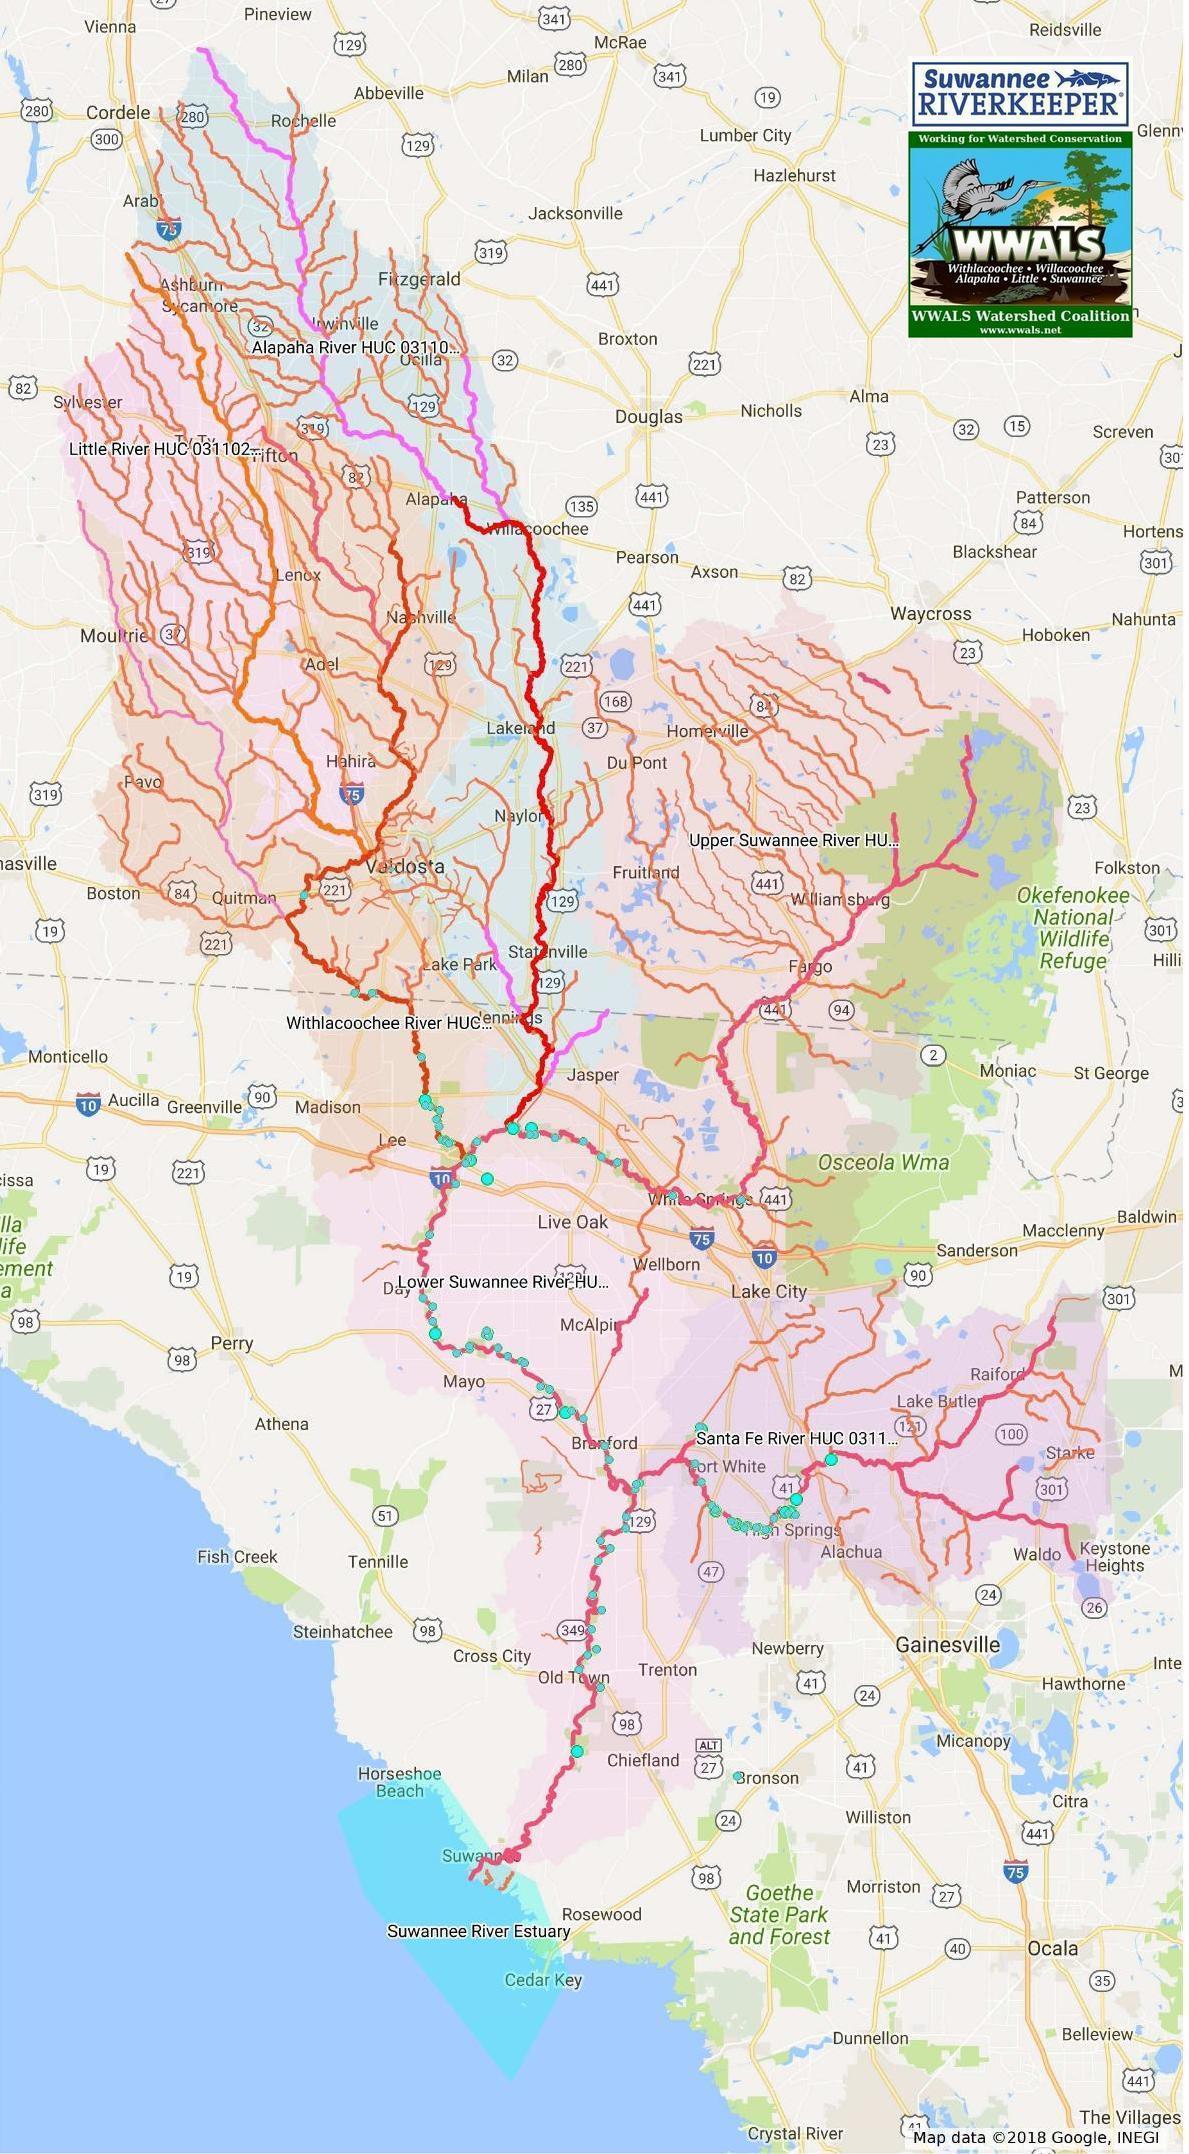 1189x2154 Basins Labeled, Basin, in Suwannee Maps, by John S. Quarterman, for WWALS.net, 13 November 2017